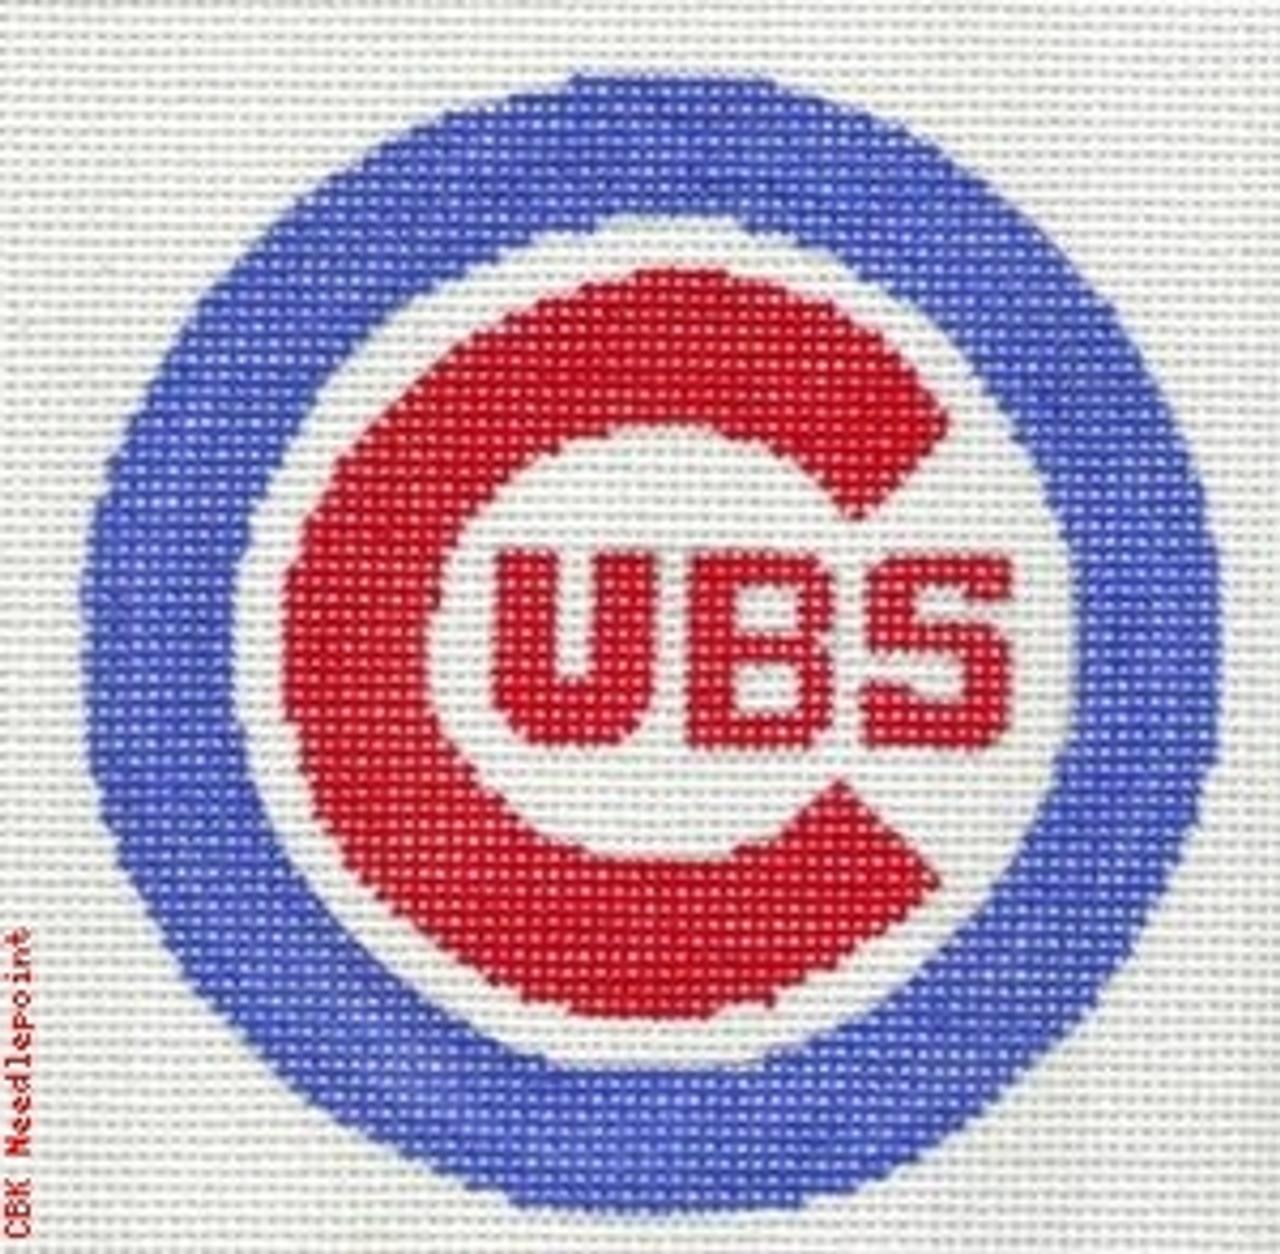 c2cef9a974529 511 Chicago Cubs Logo - Baseball 18 Mesh 4